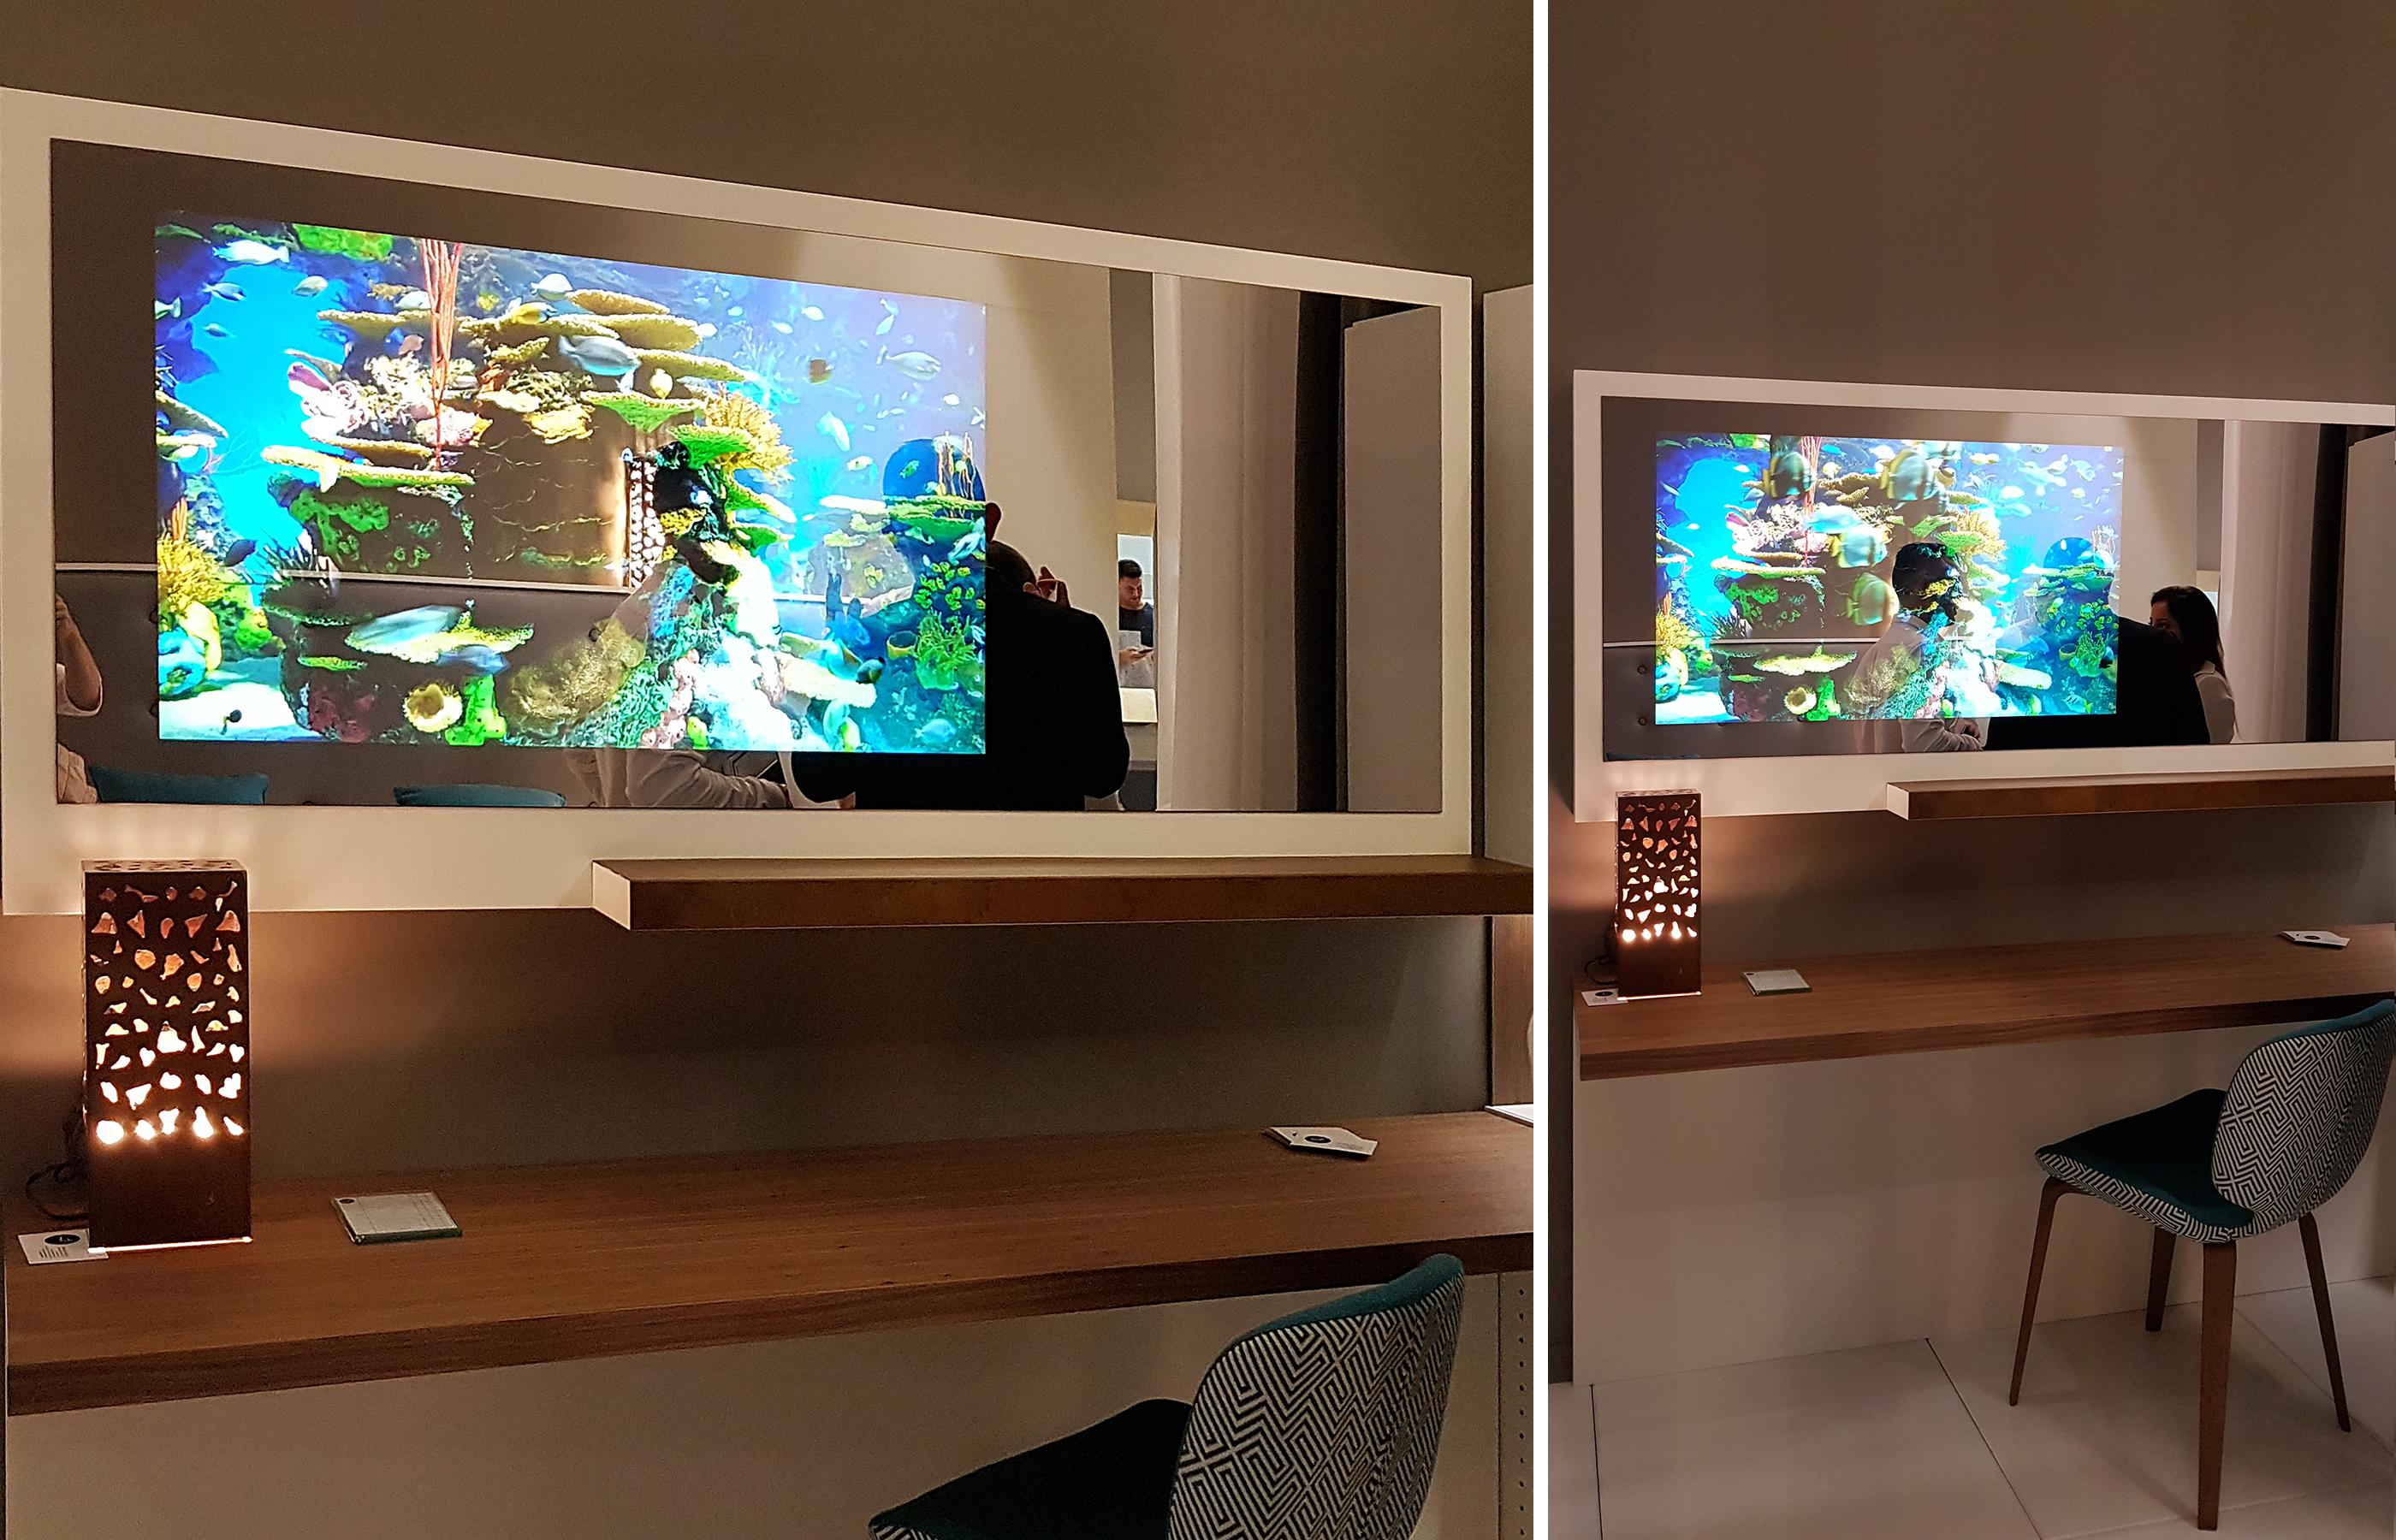 Зеркало со встроенным телевизором